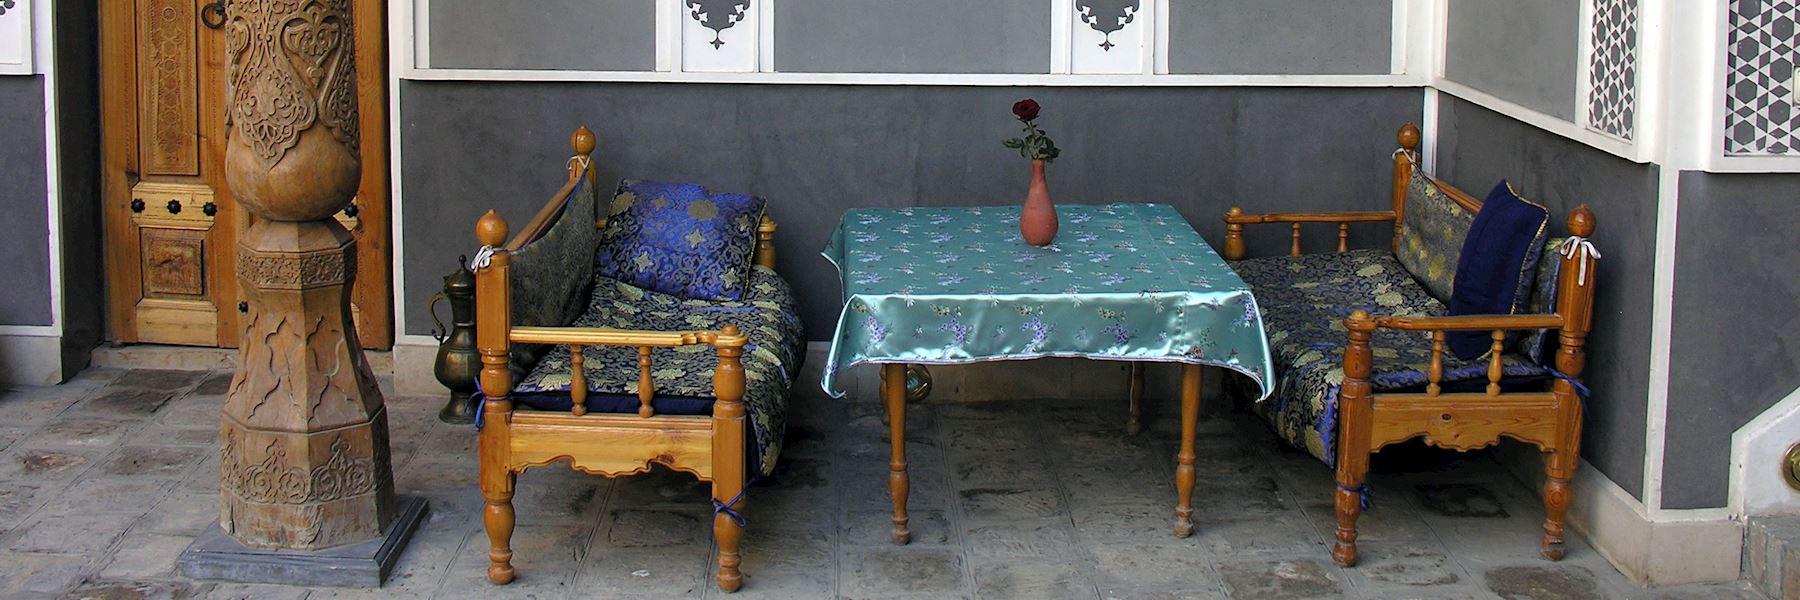 Accommodation in Uzbekistan